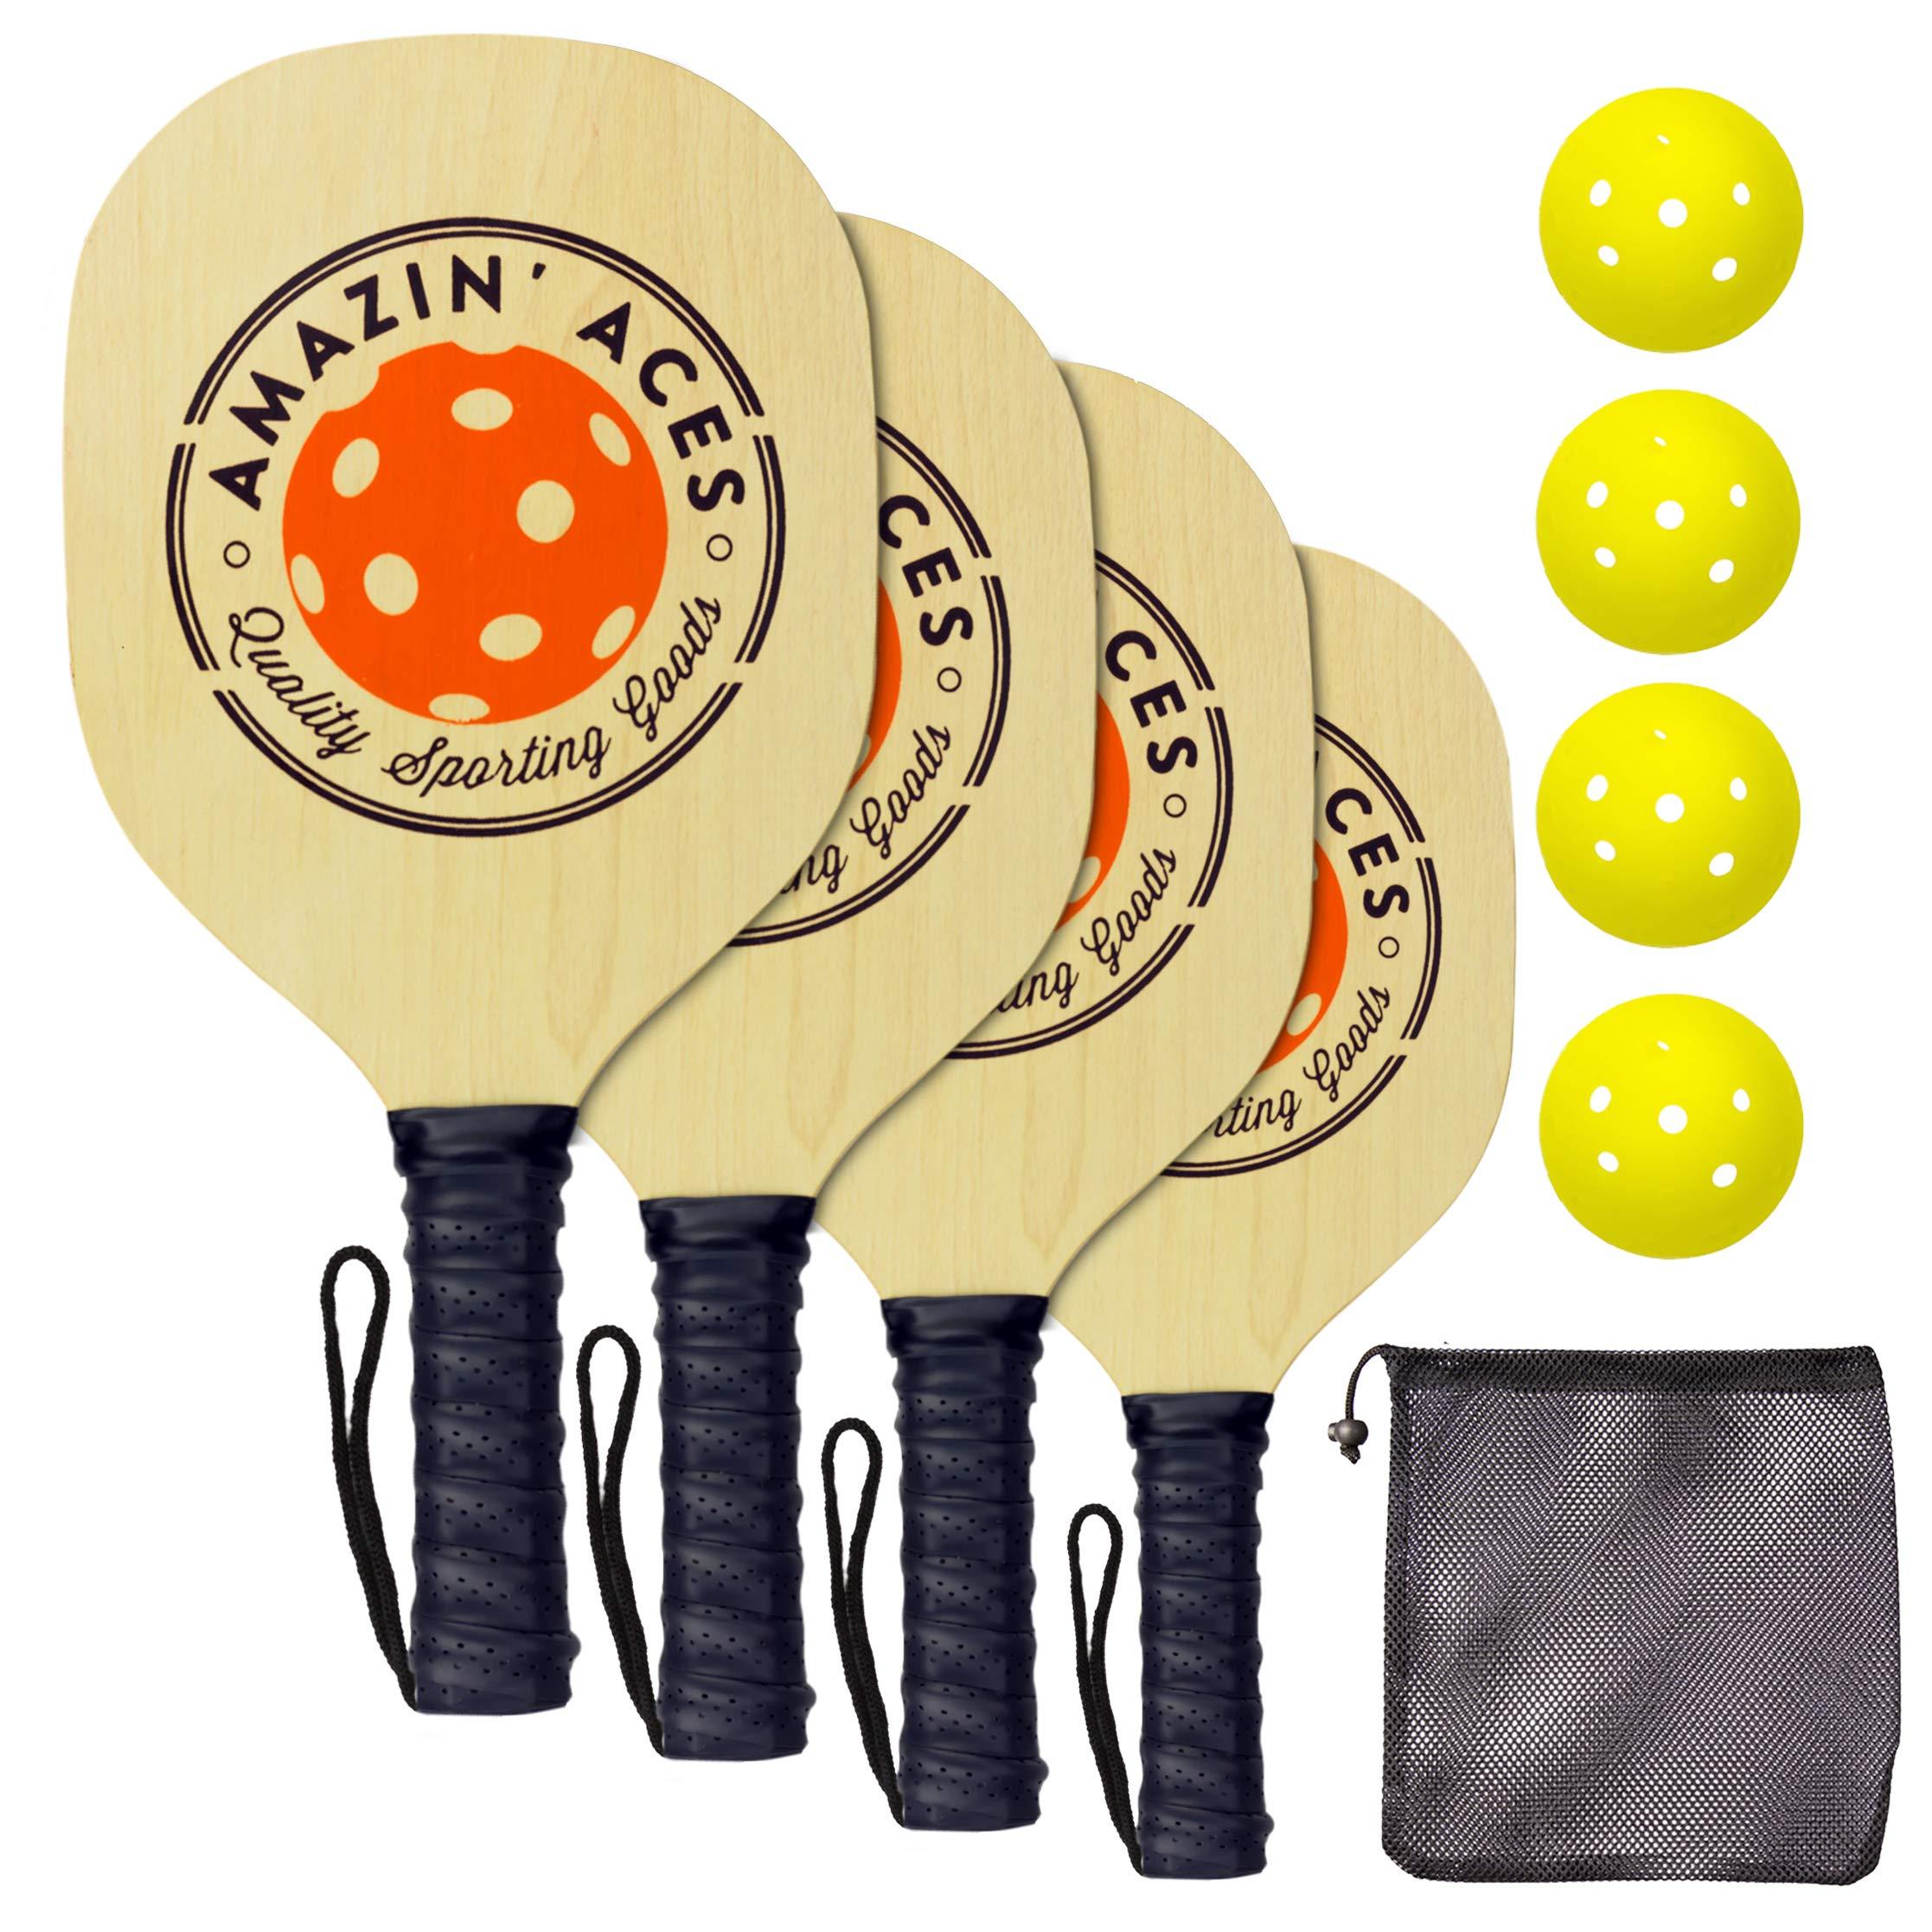 Amazin' Aces Pickleball Paddle Set Pickleball Set Includes 2-4 Wood Pickleball Paddles, 4 Pickleballs, 1 Carry Bag & Guaranteed Fun! | Beginner-Intermediate Racket | Includes Free eBook